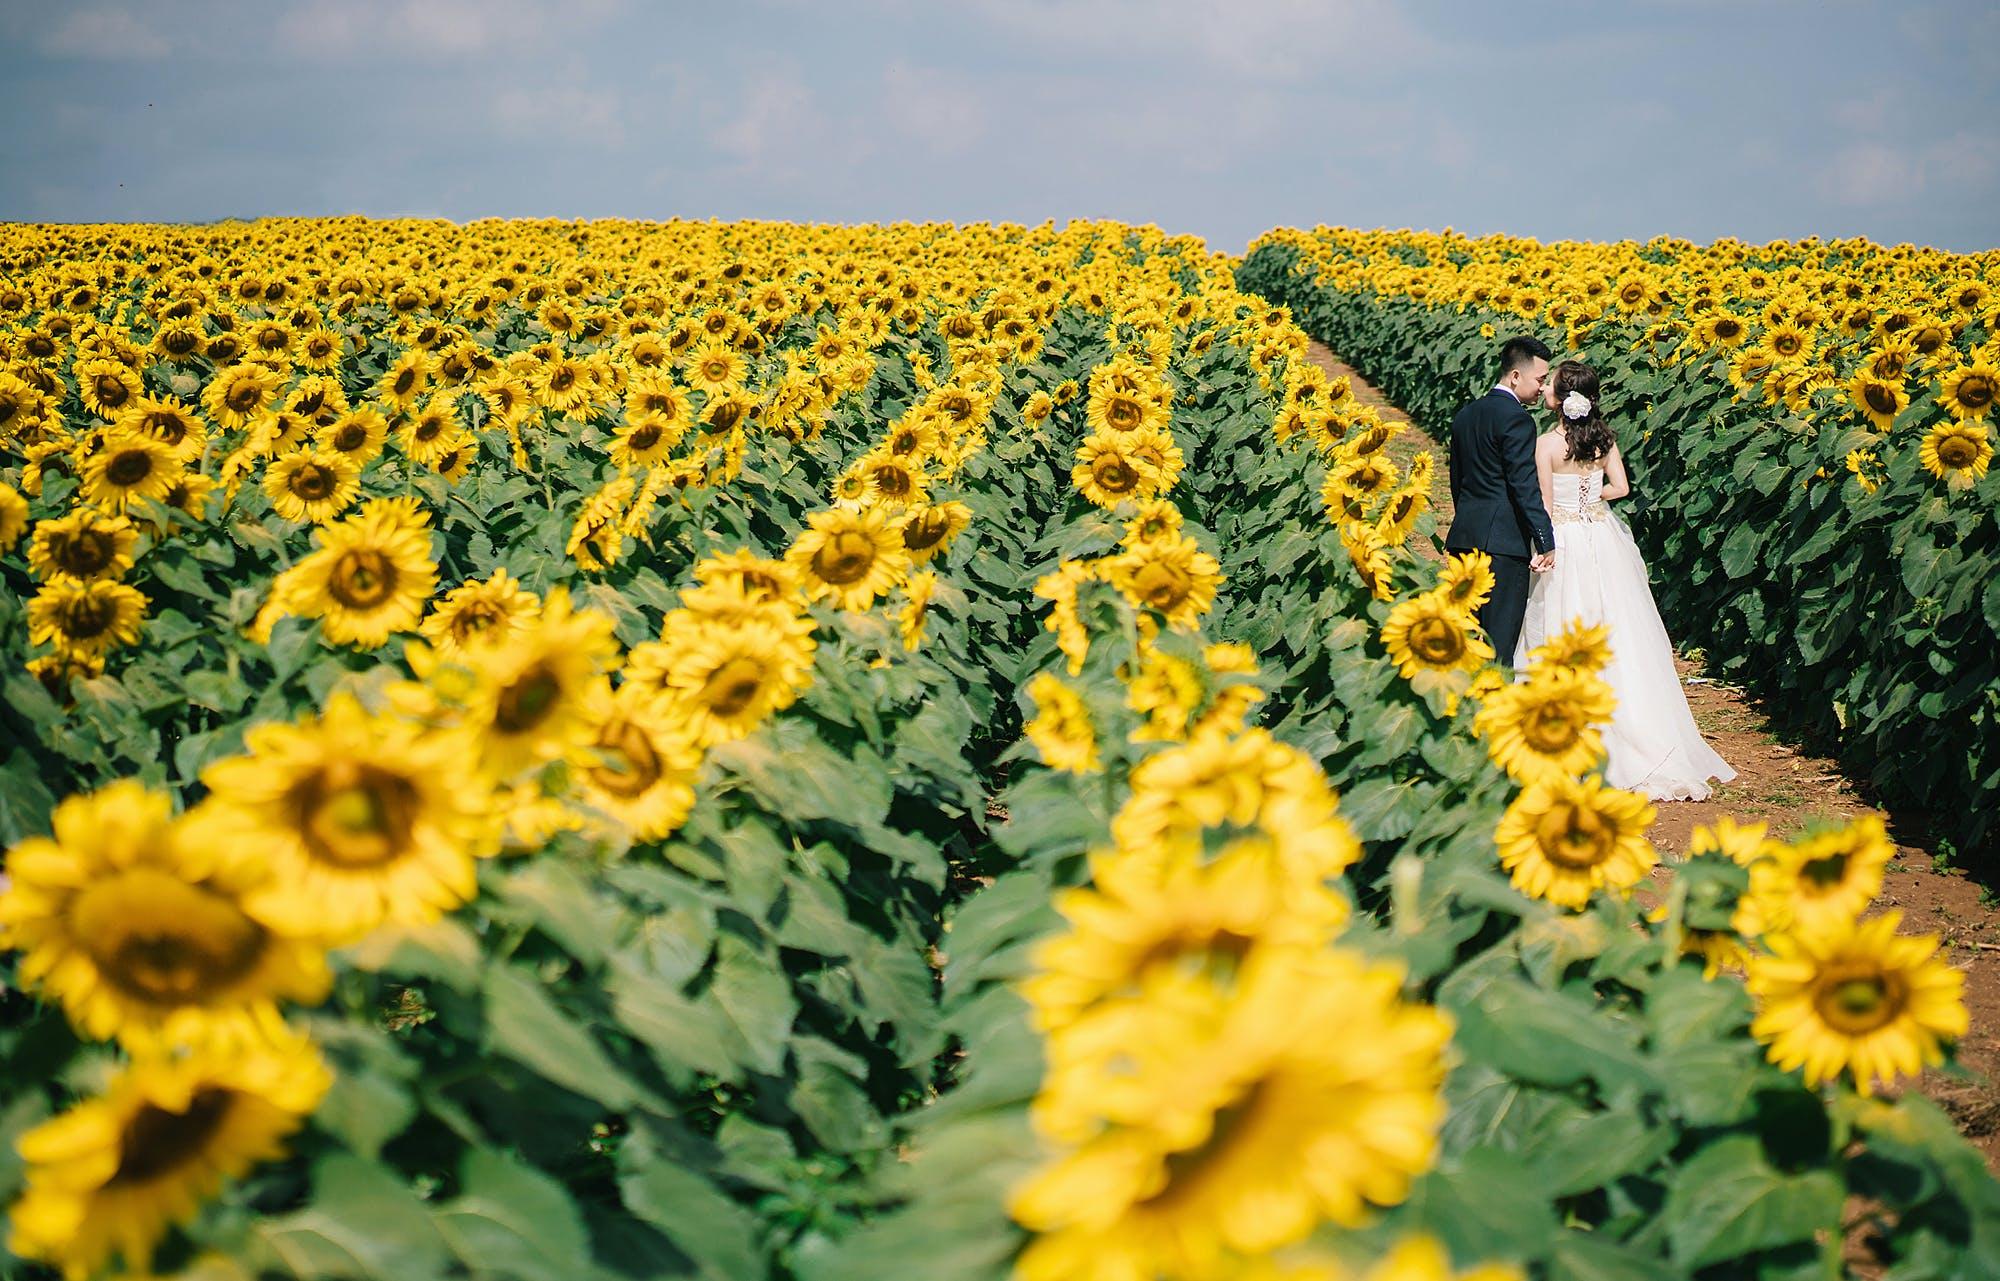 Free stock photo of sky, love, garden, yellow